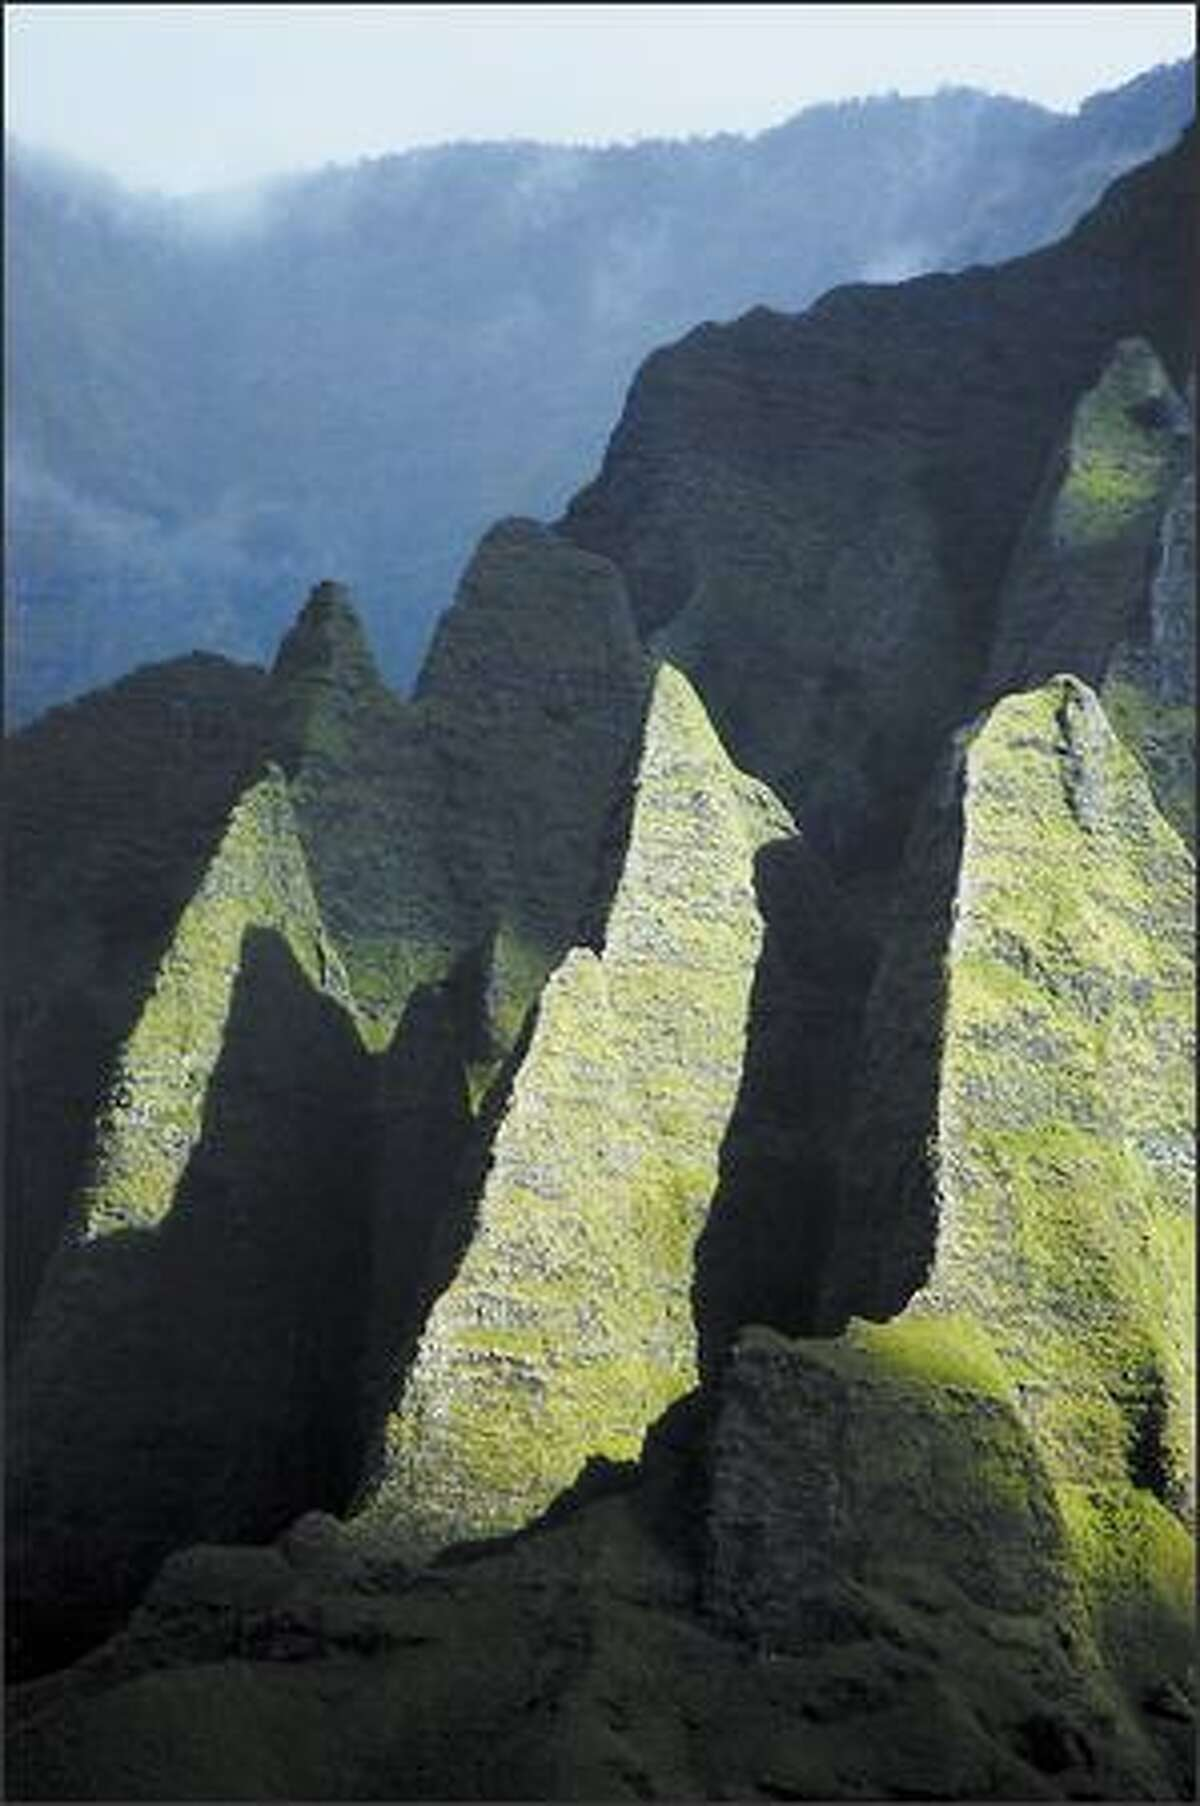 The morning sun kisses the otherworldly terrain of the Kalalau Valley along the Na Pali Coast.